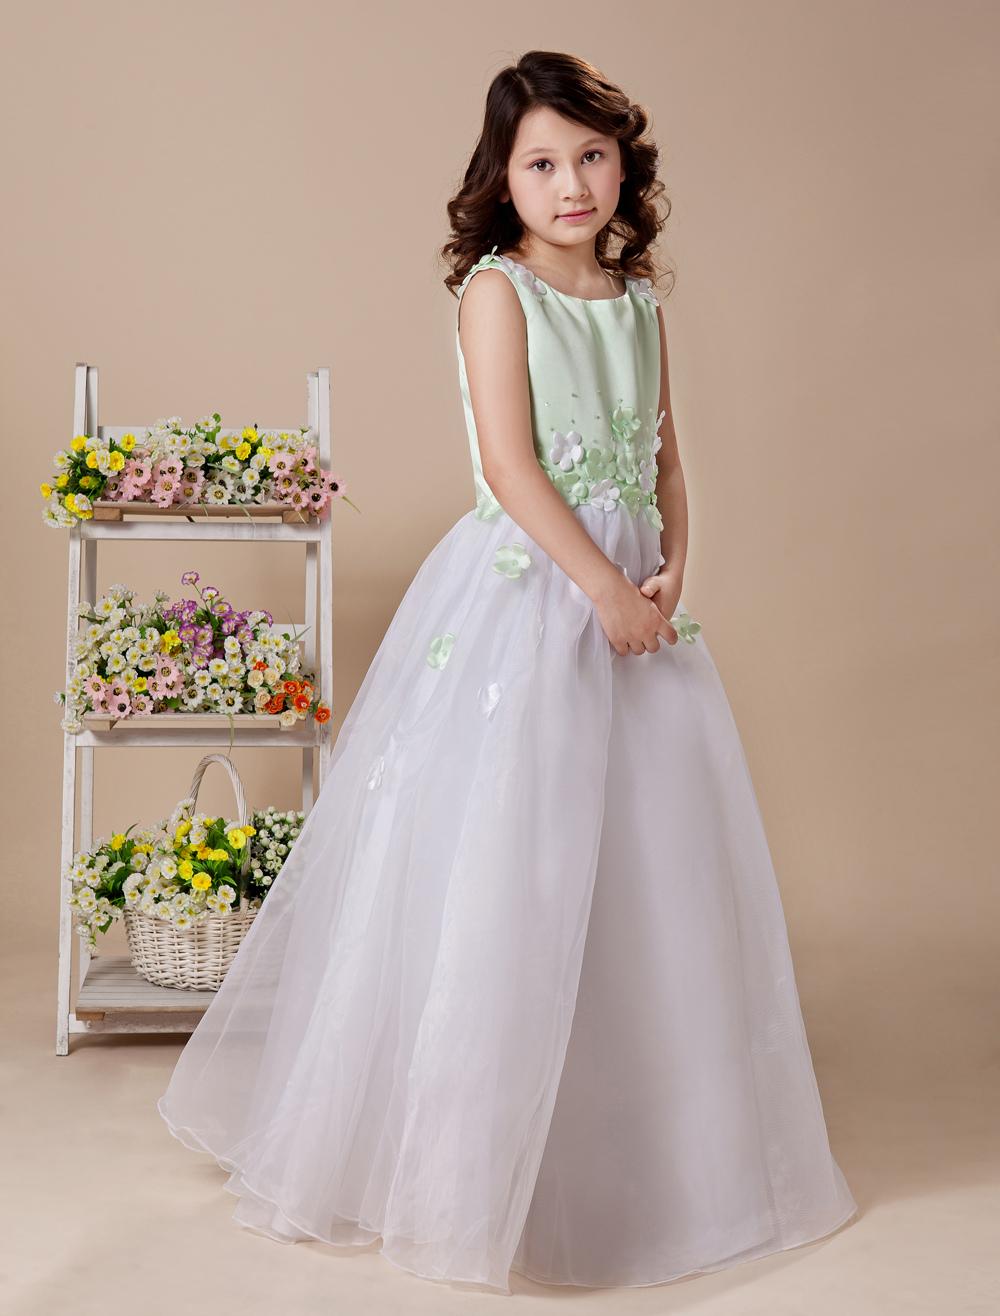 81f265691a1 Beauteous White A-line Jewel Satin Floor Length Flower Girl Dress -  Milanoo.com